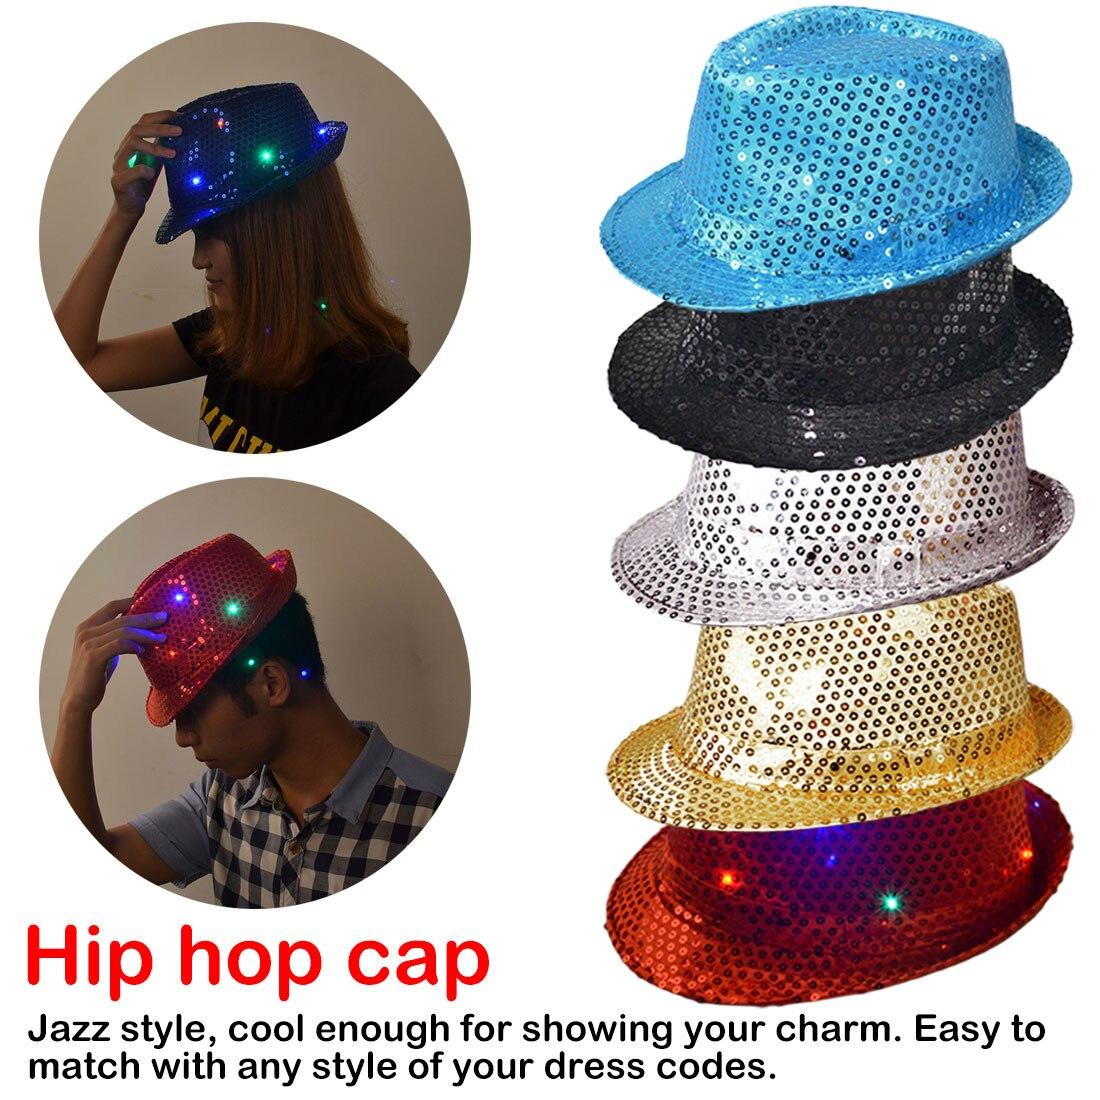 Wedding Decoration Halloween Hats Caps Sequins LED Light Jazz Hats Man Boy Woman Girl Flashing Birthday Party Cap